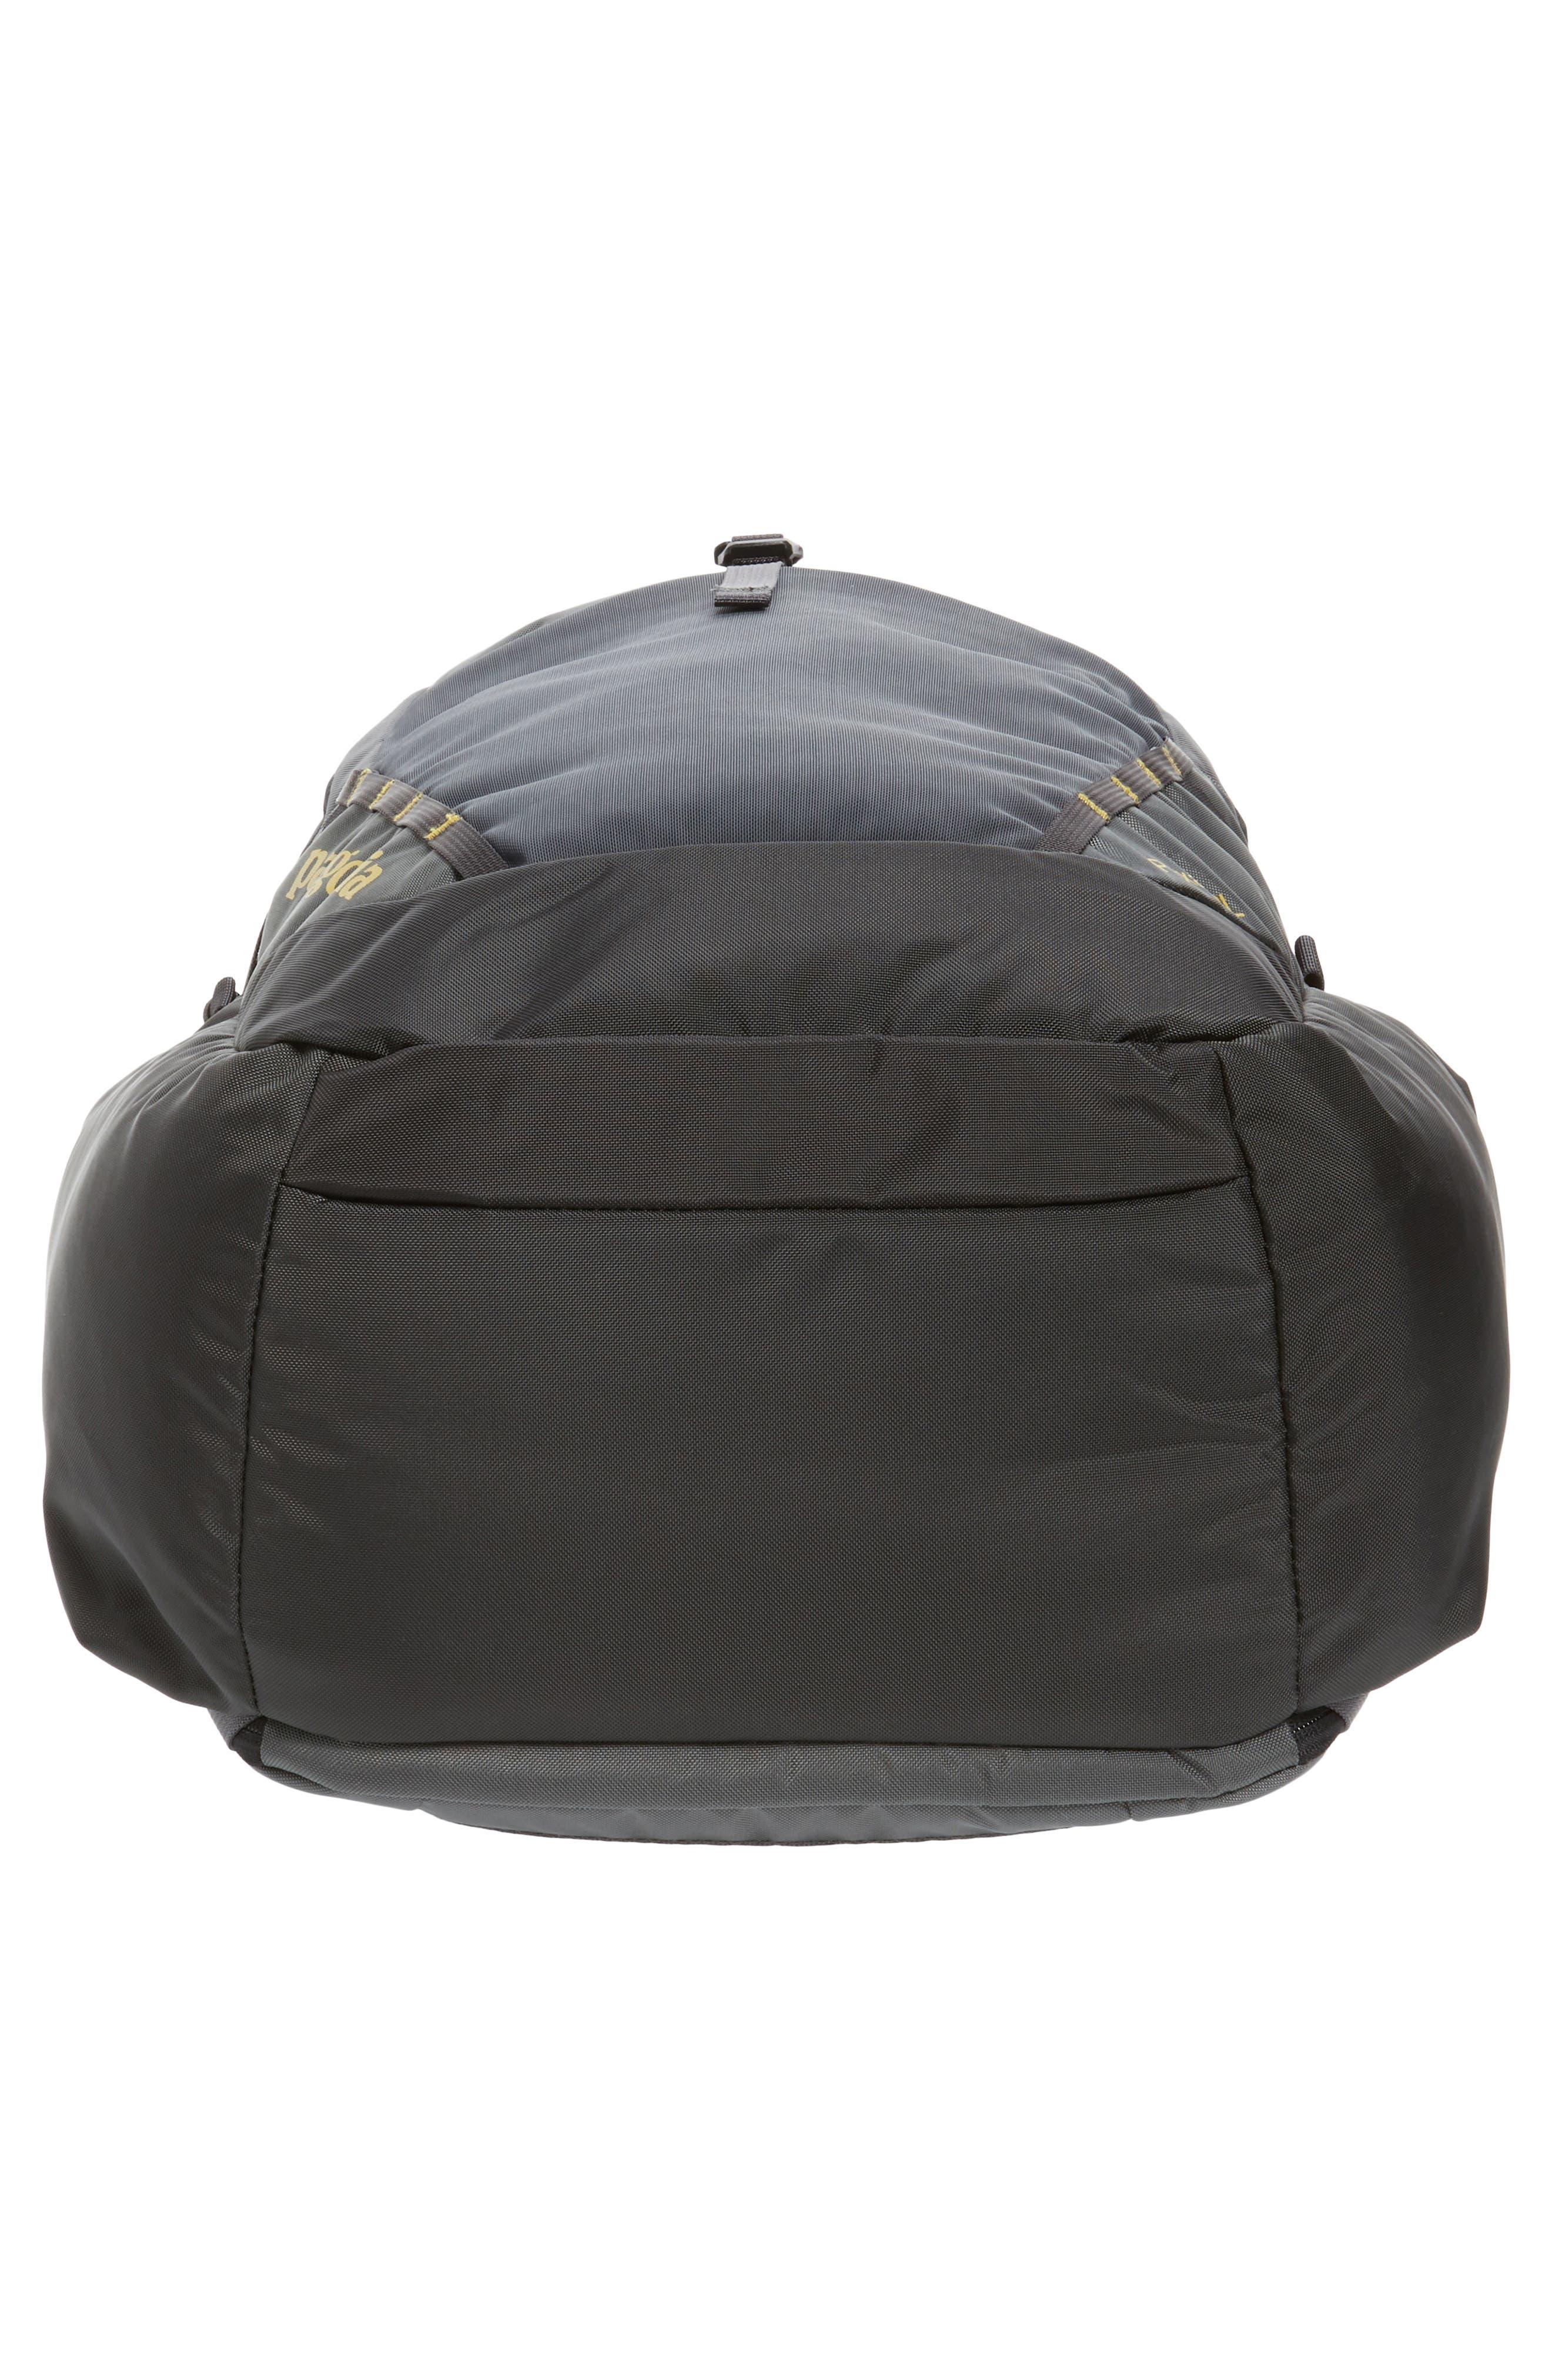 ,                             Paxat 32-Liter Backpack,                             Alternate thumbnail 19, color,                             021